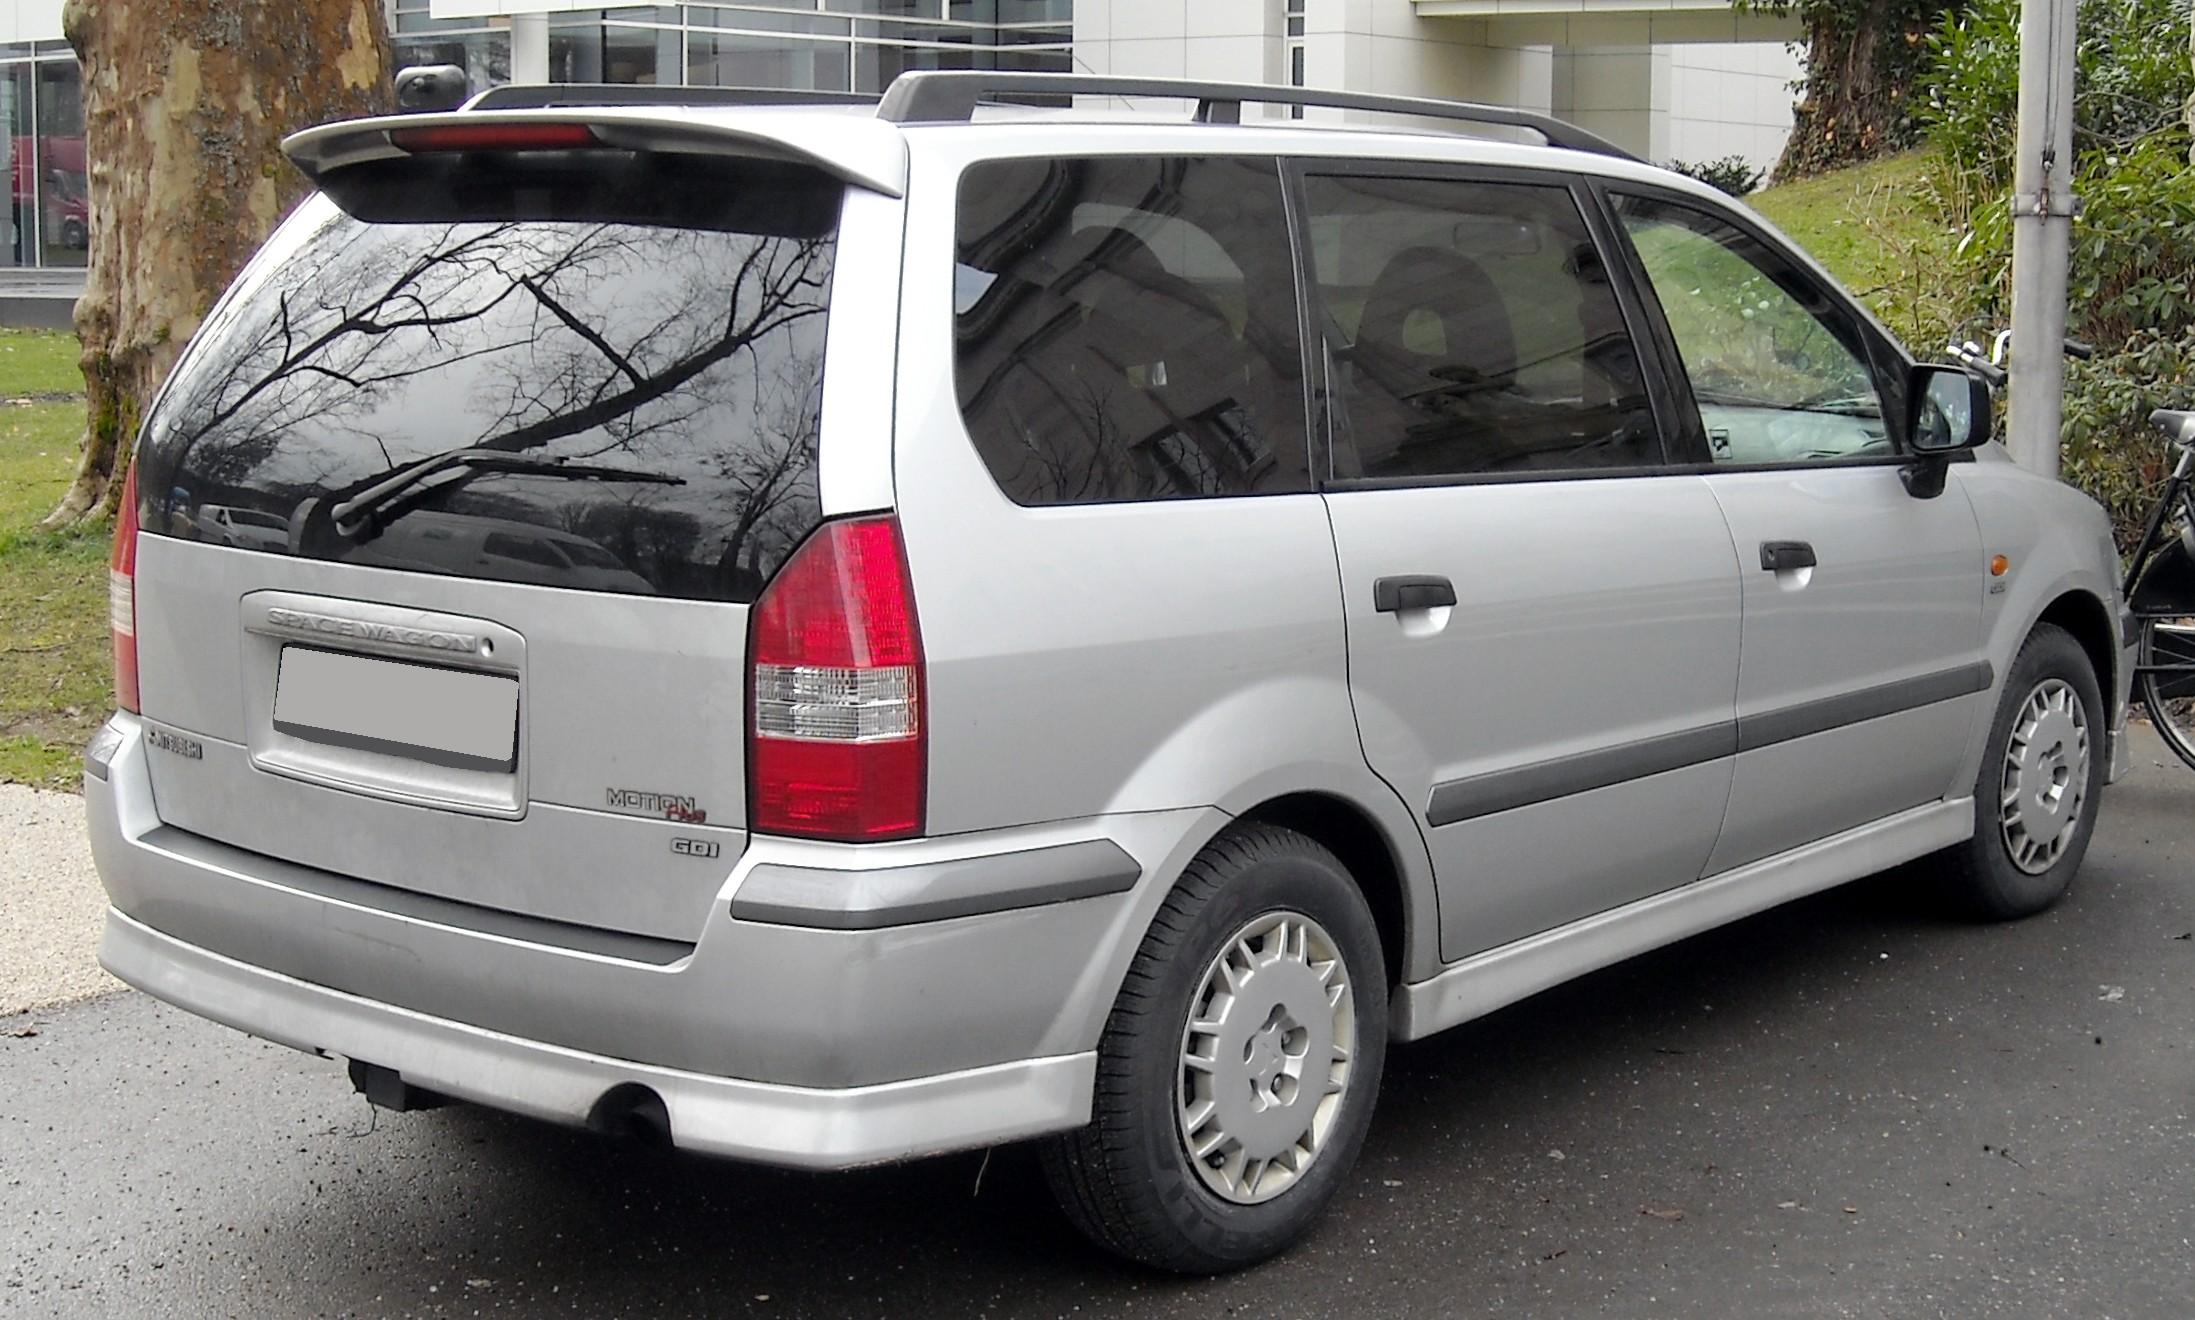 file:mitsubishi space wagon rear 20090121 - wikimedia commons